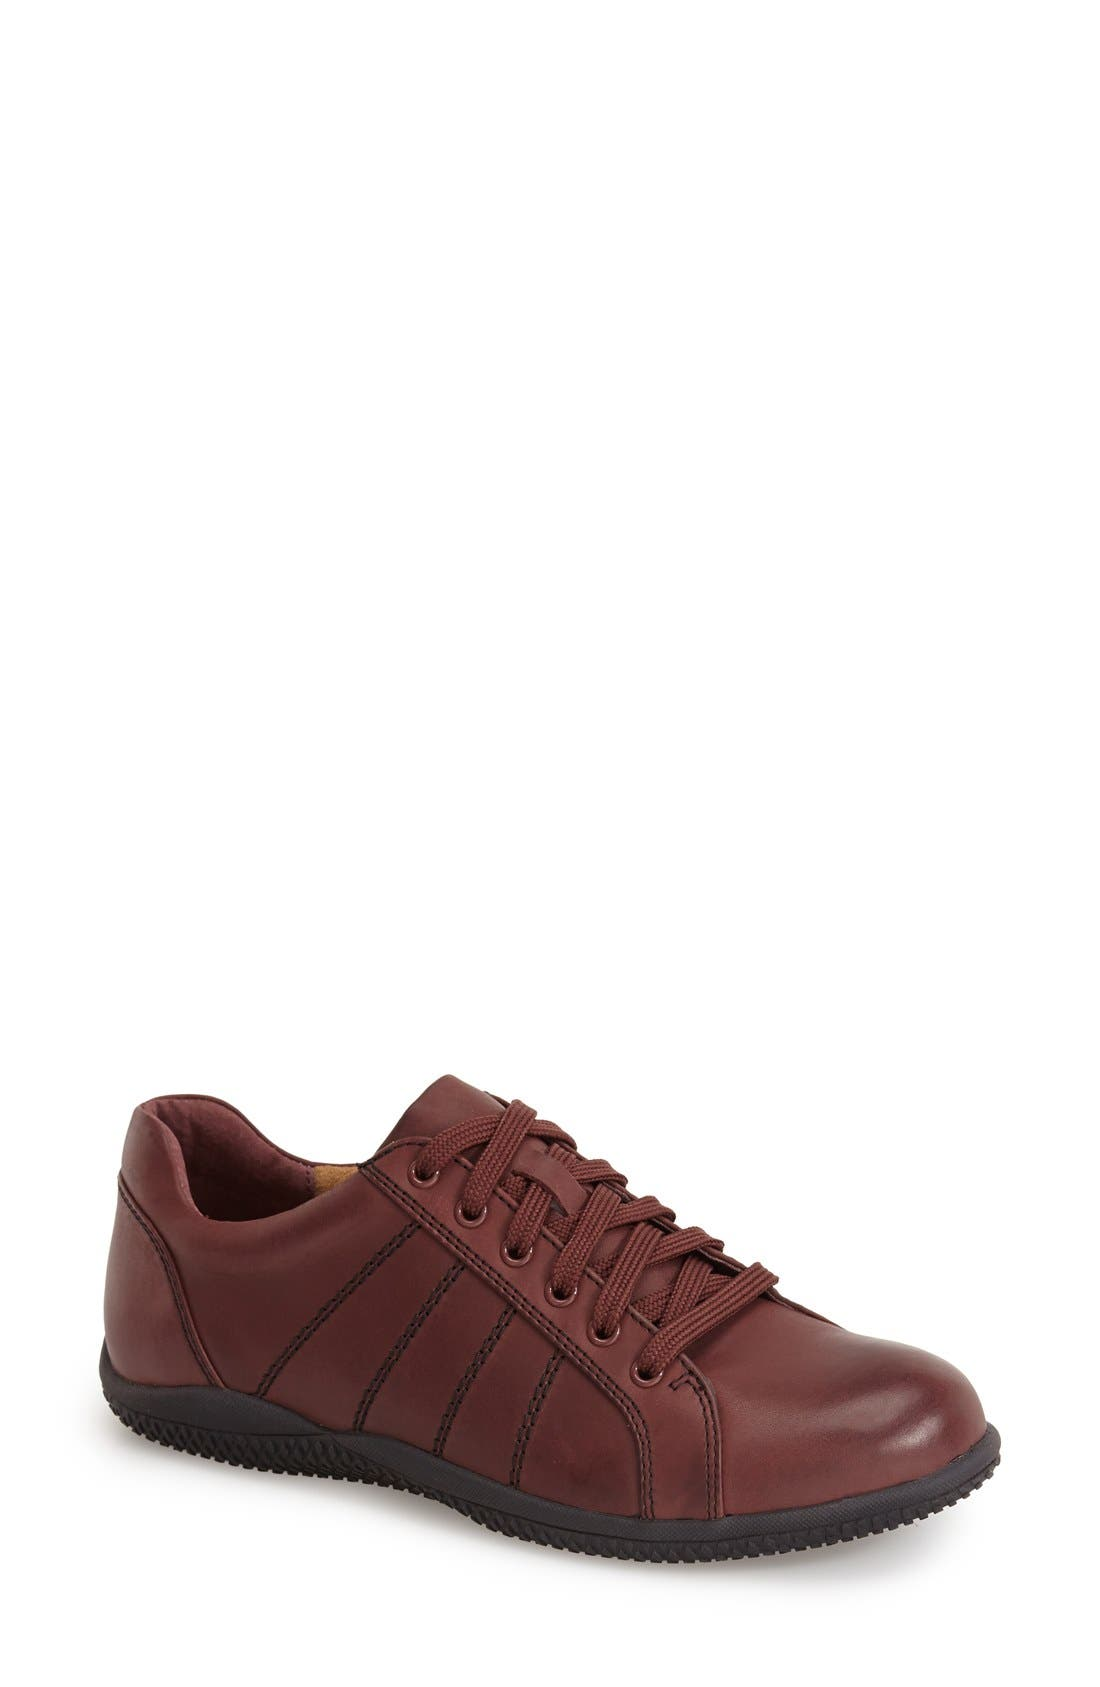 'Hickory' Sneaker,                             Main thumbnail 1, color,                             Dark Red